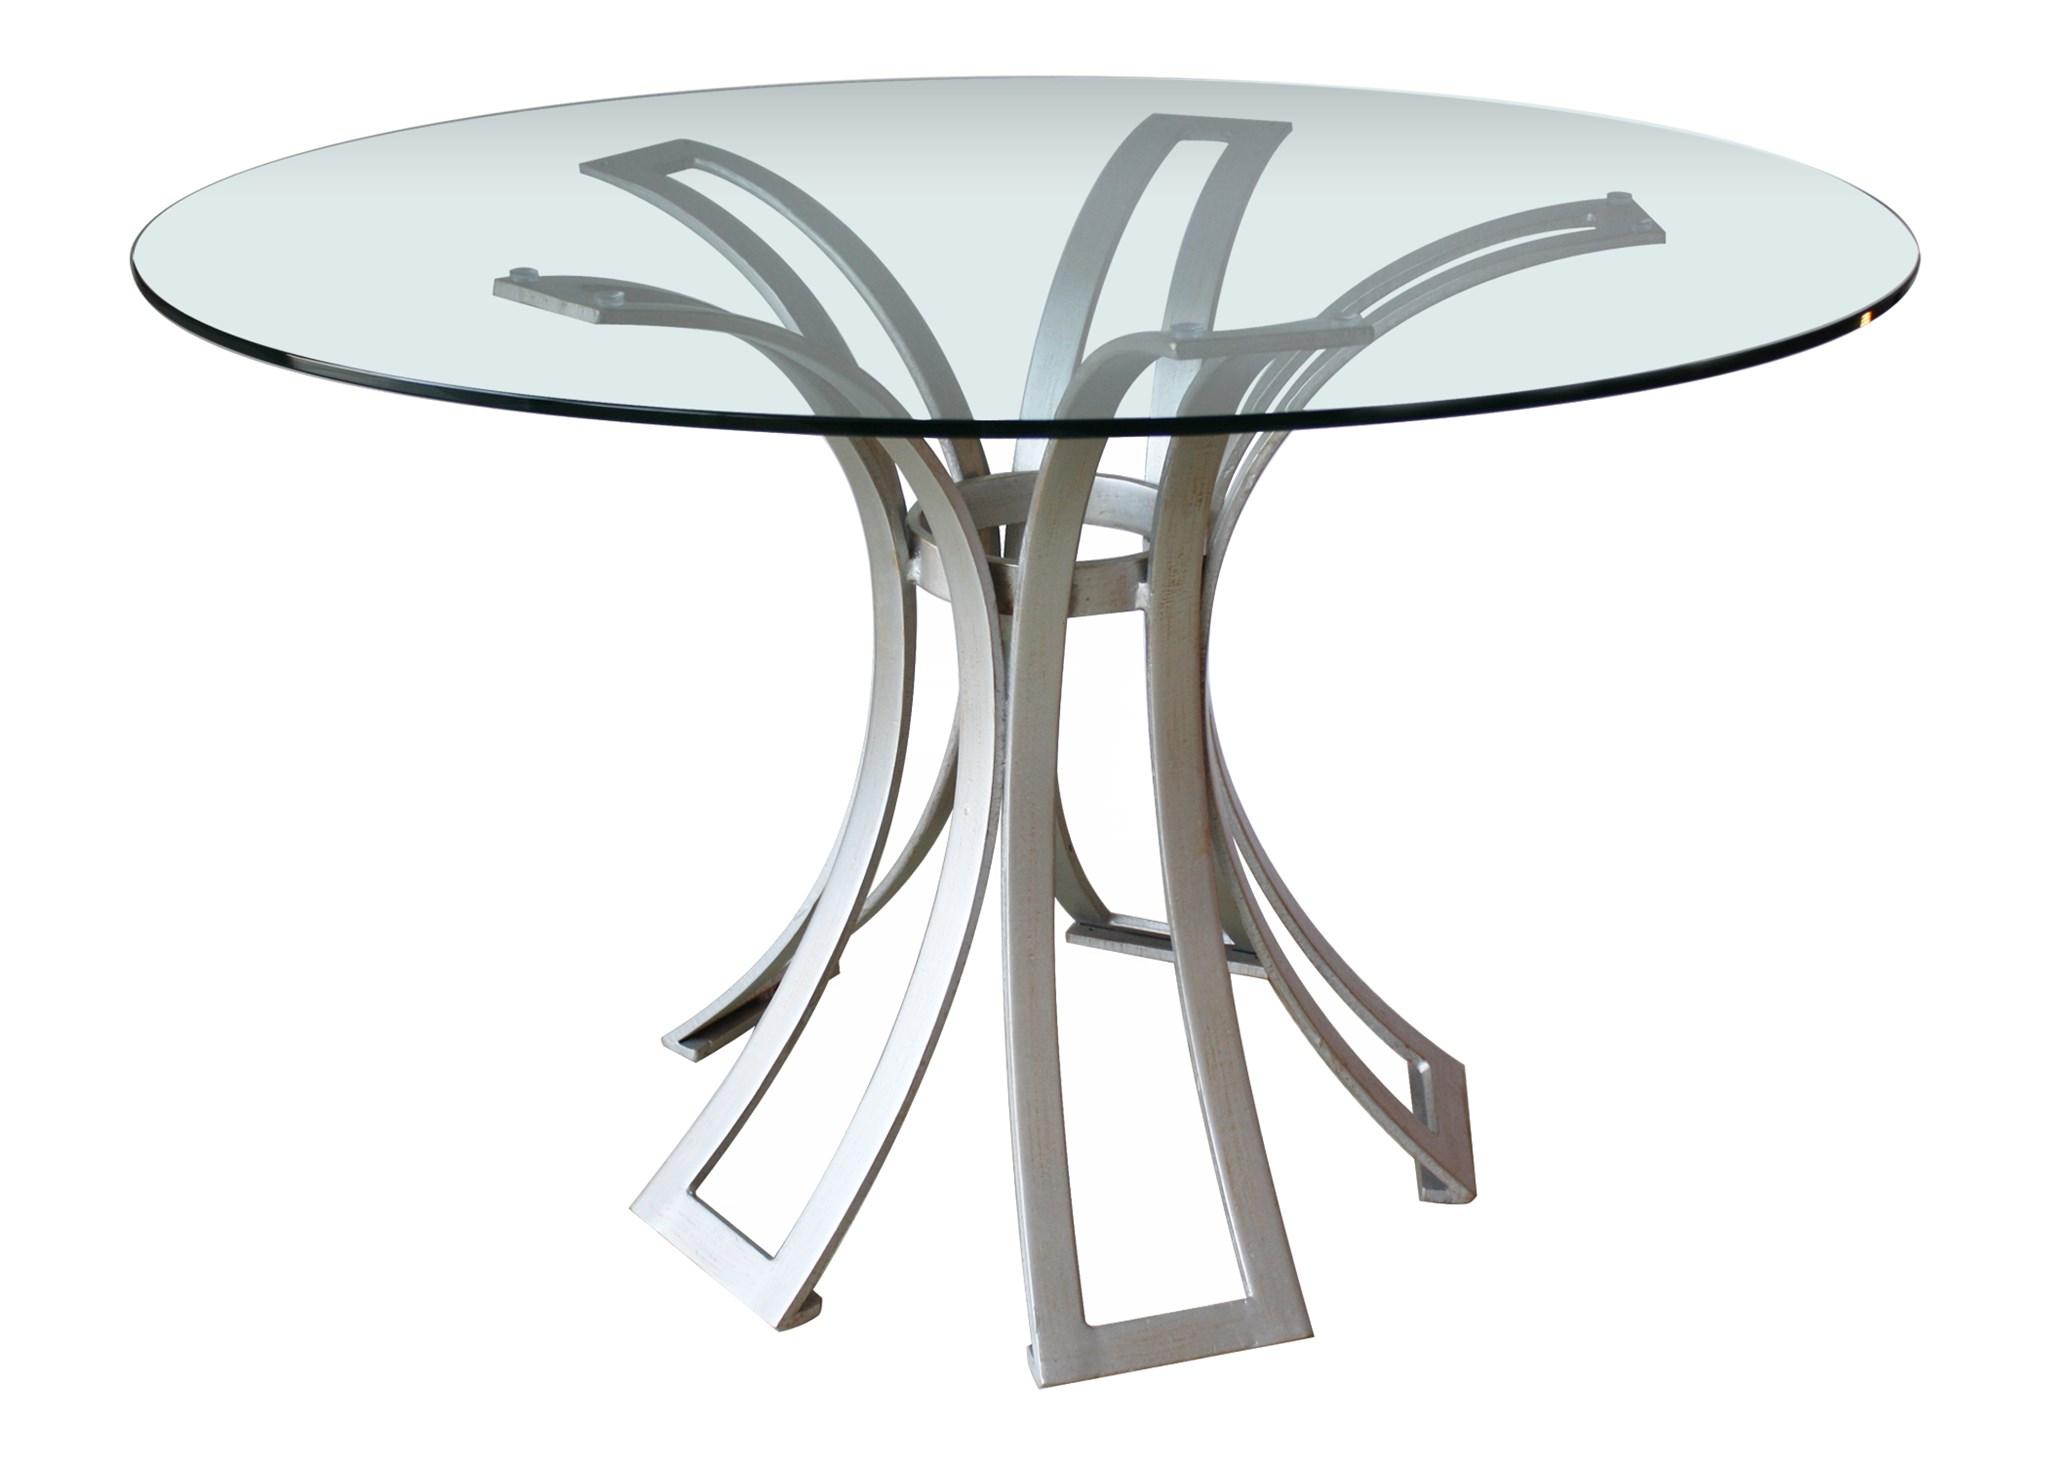 Klismos Wrought Iron Dining Table Base   Silver Finish